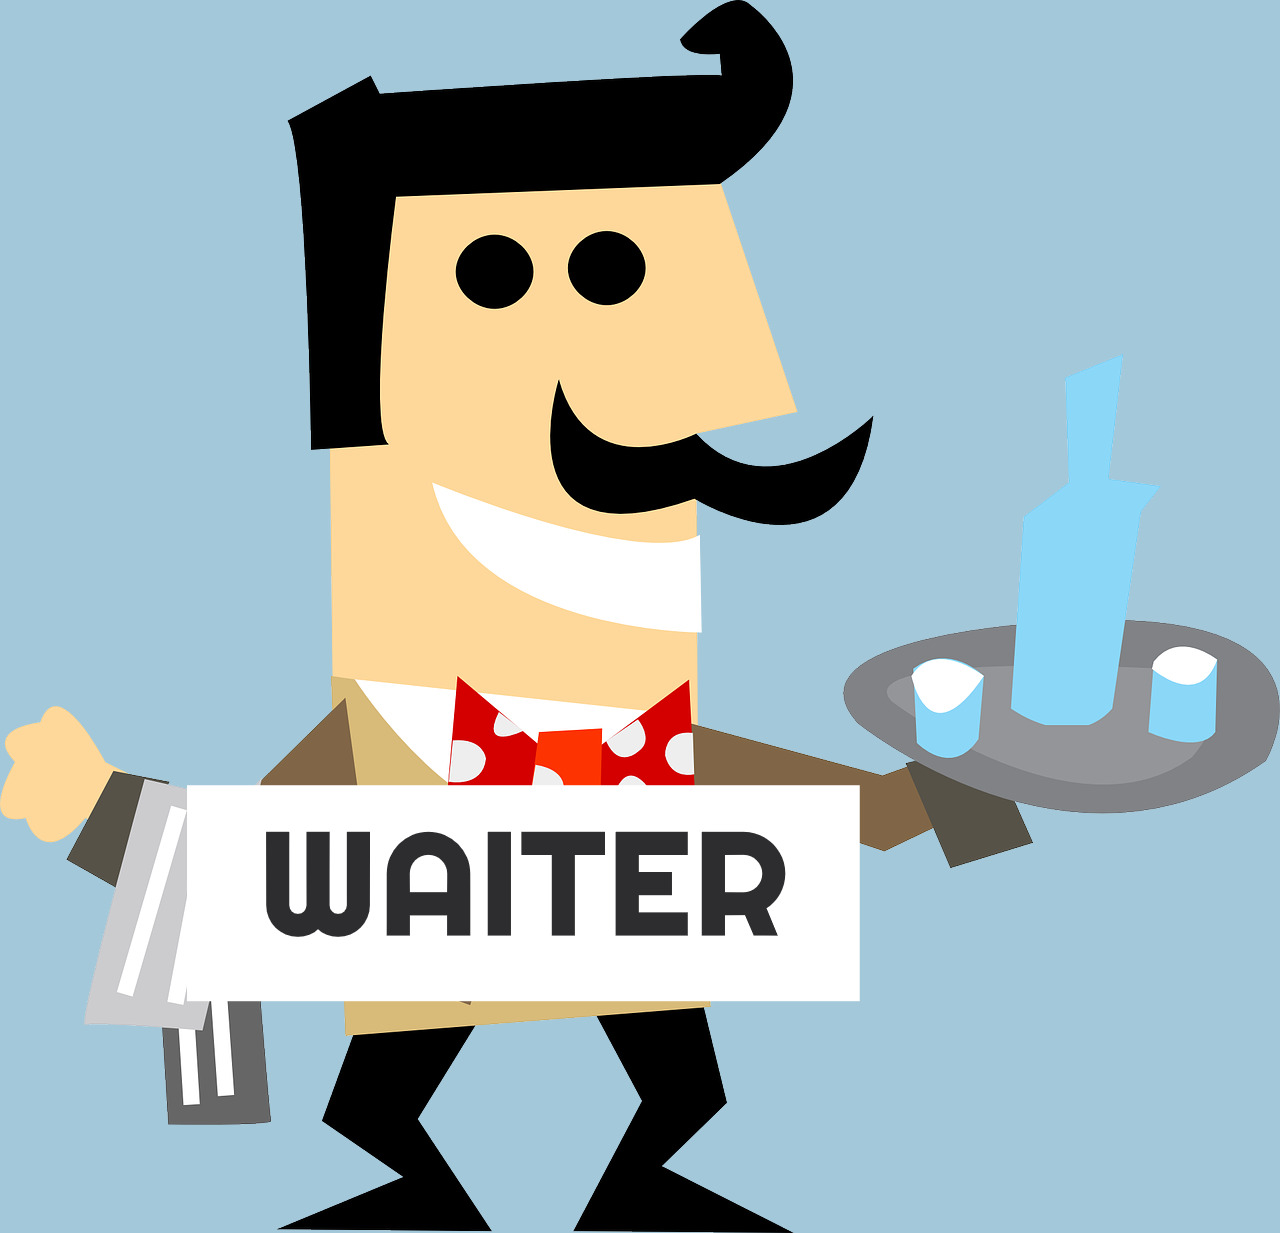 waiter-150452_1280_edited